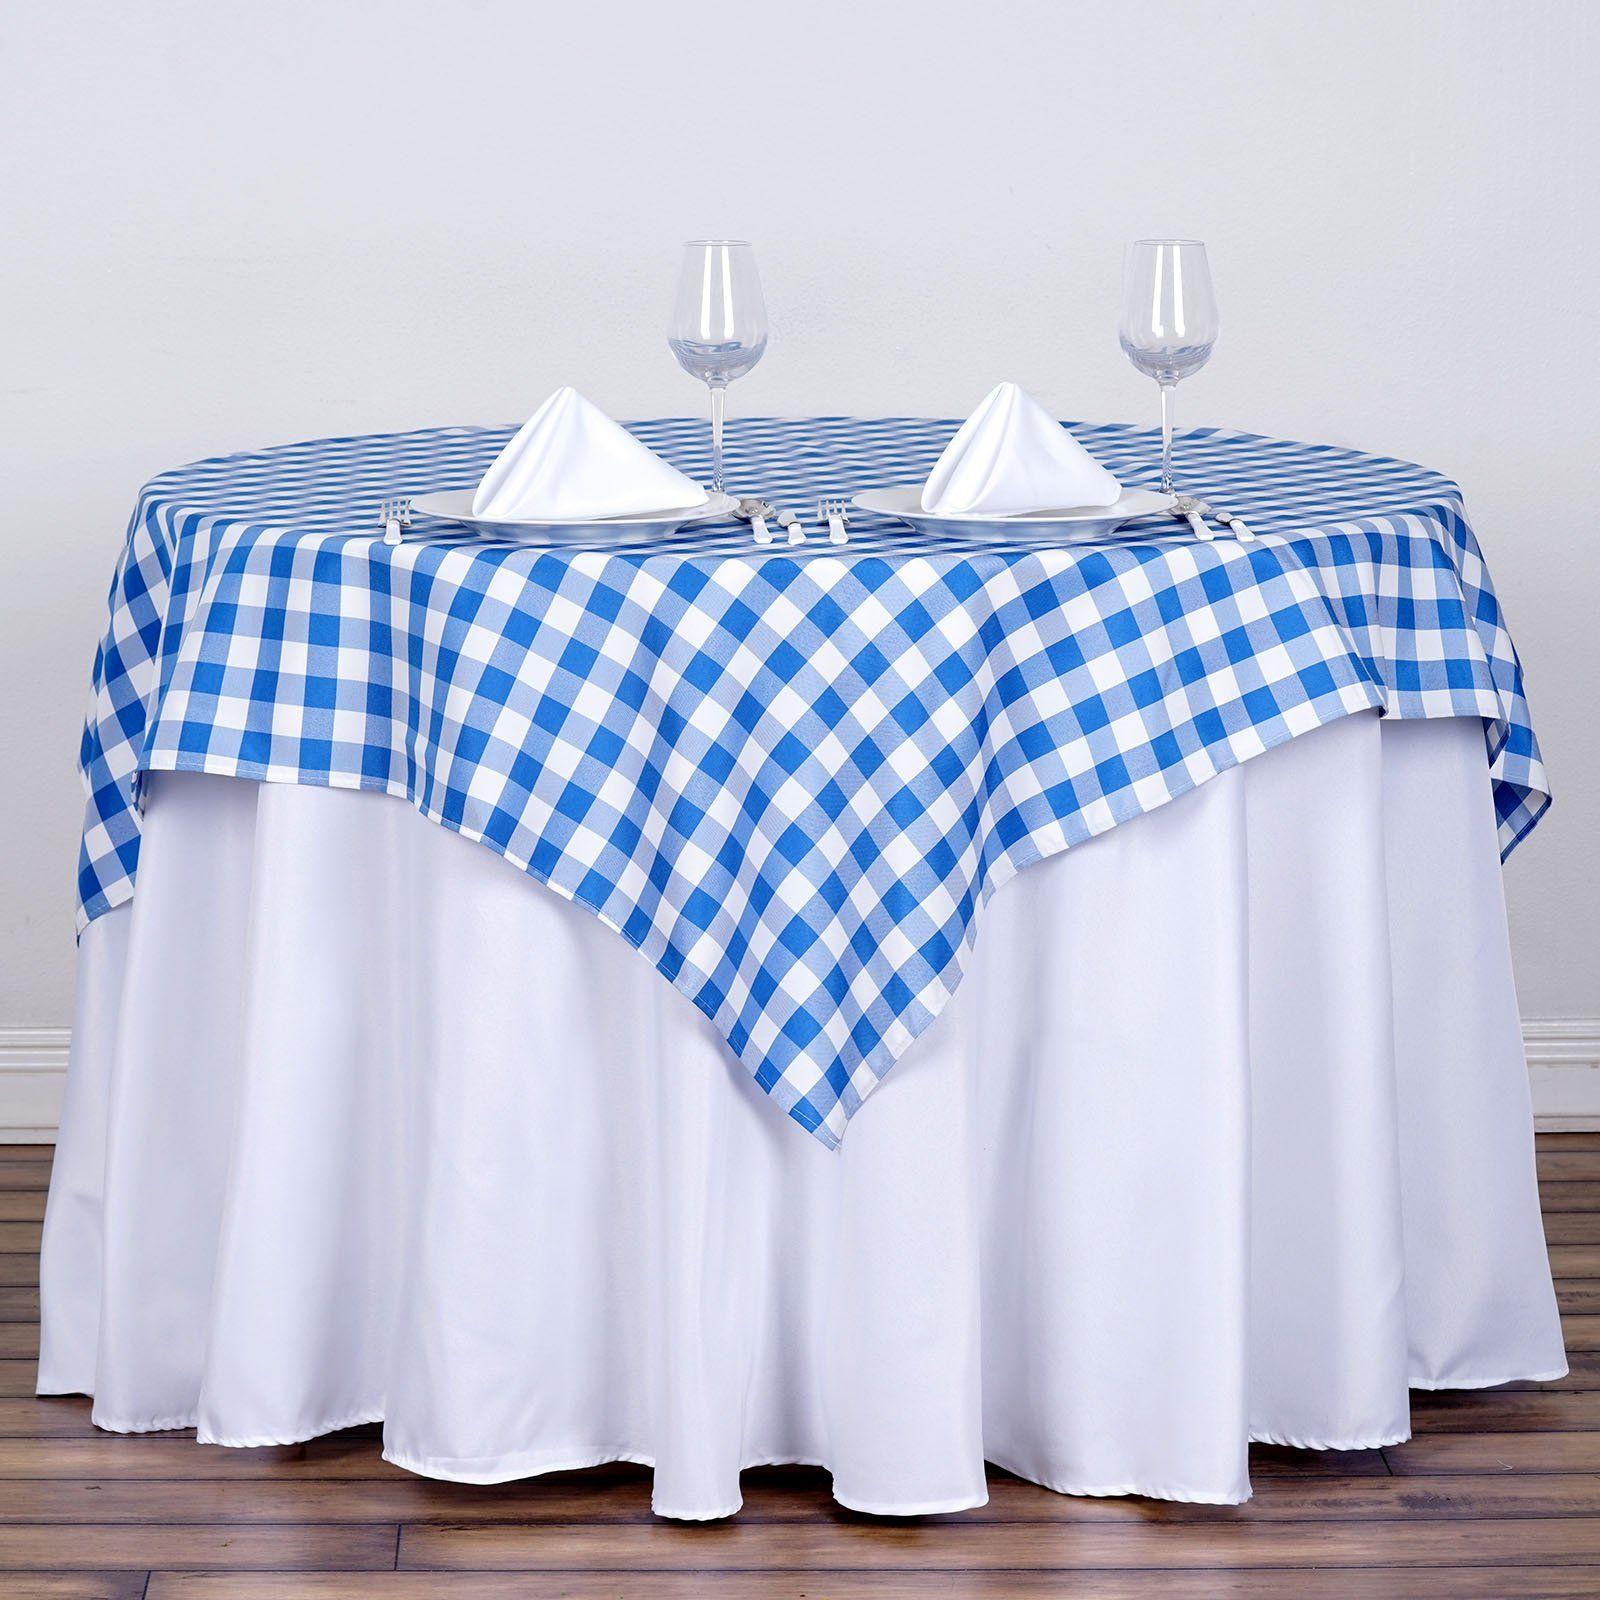 Buffalo Plaid Tablecloth 54 X54 Square White Blue Checkered